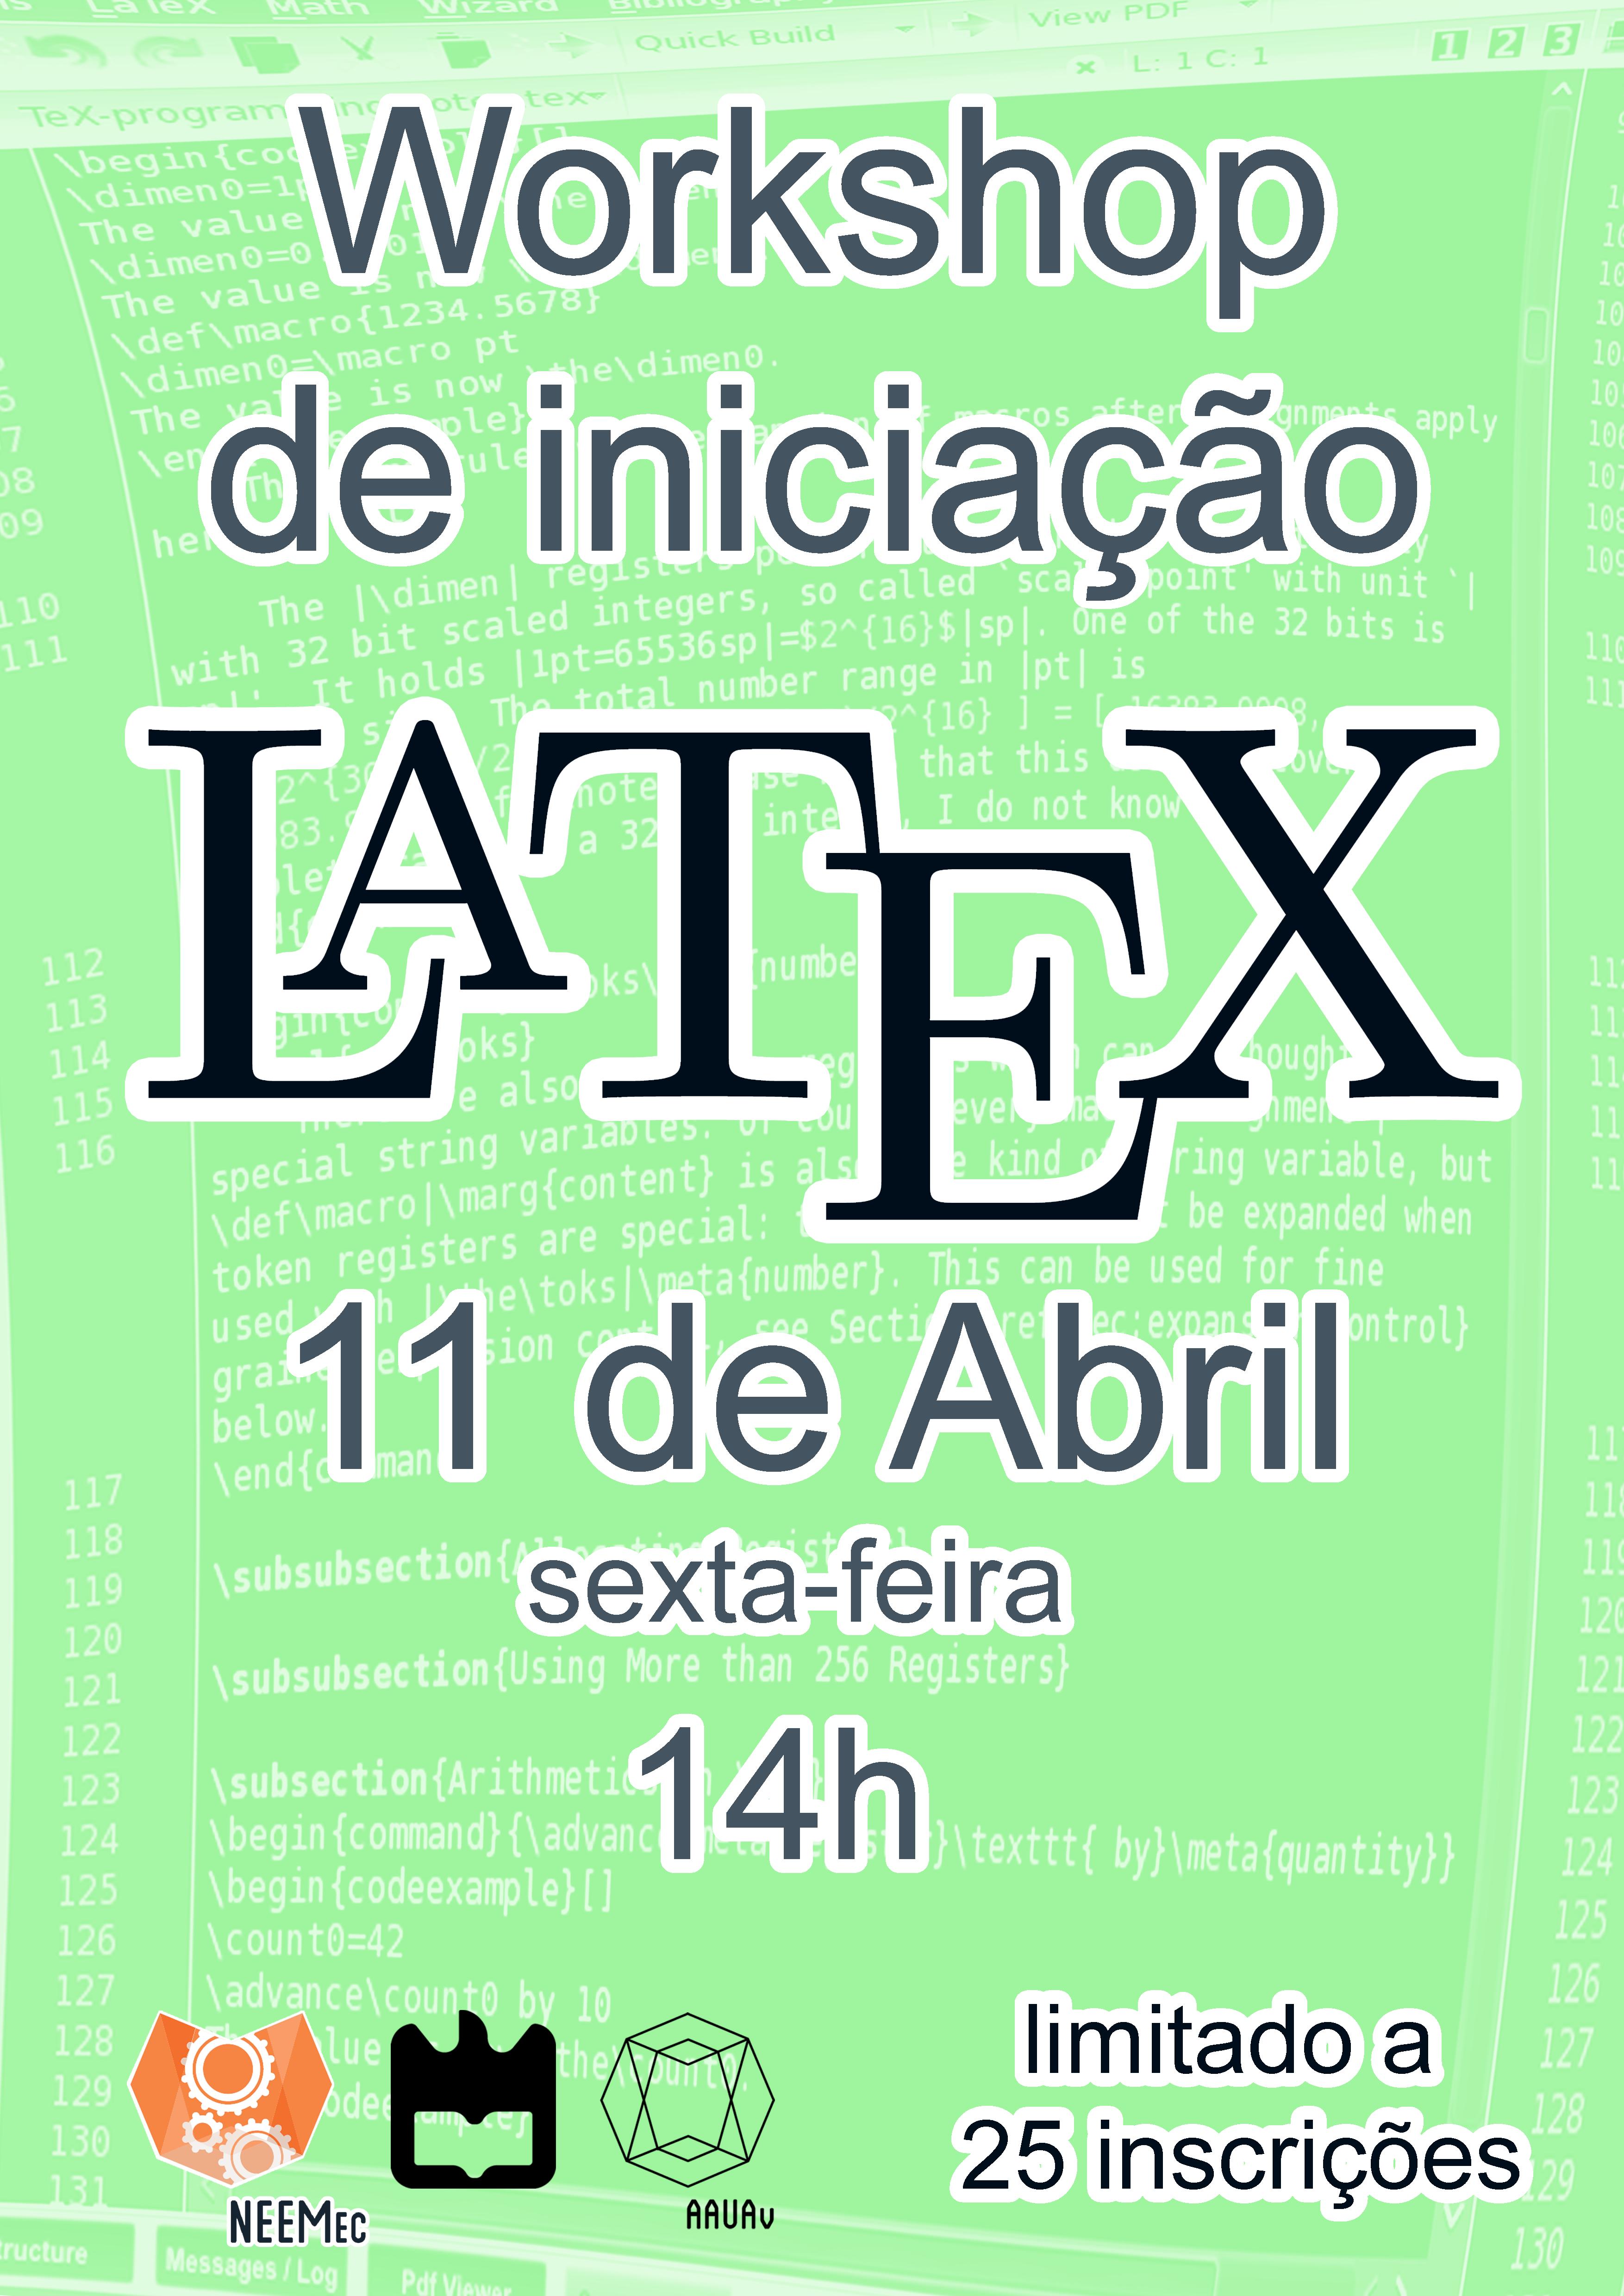 latex333